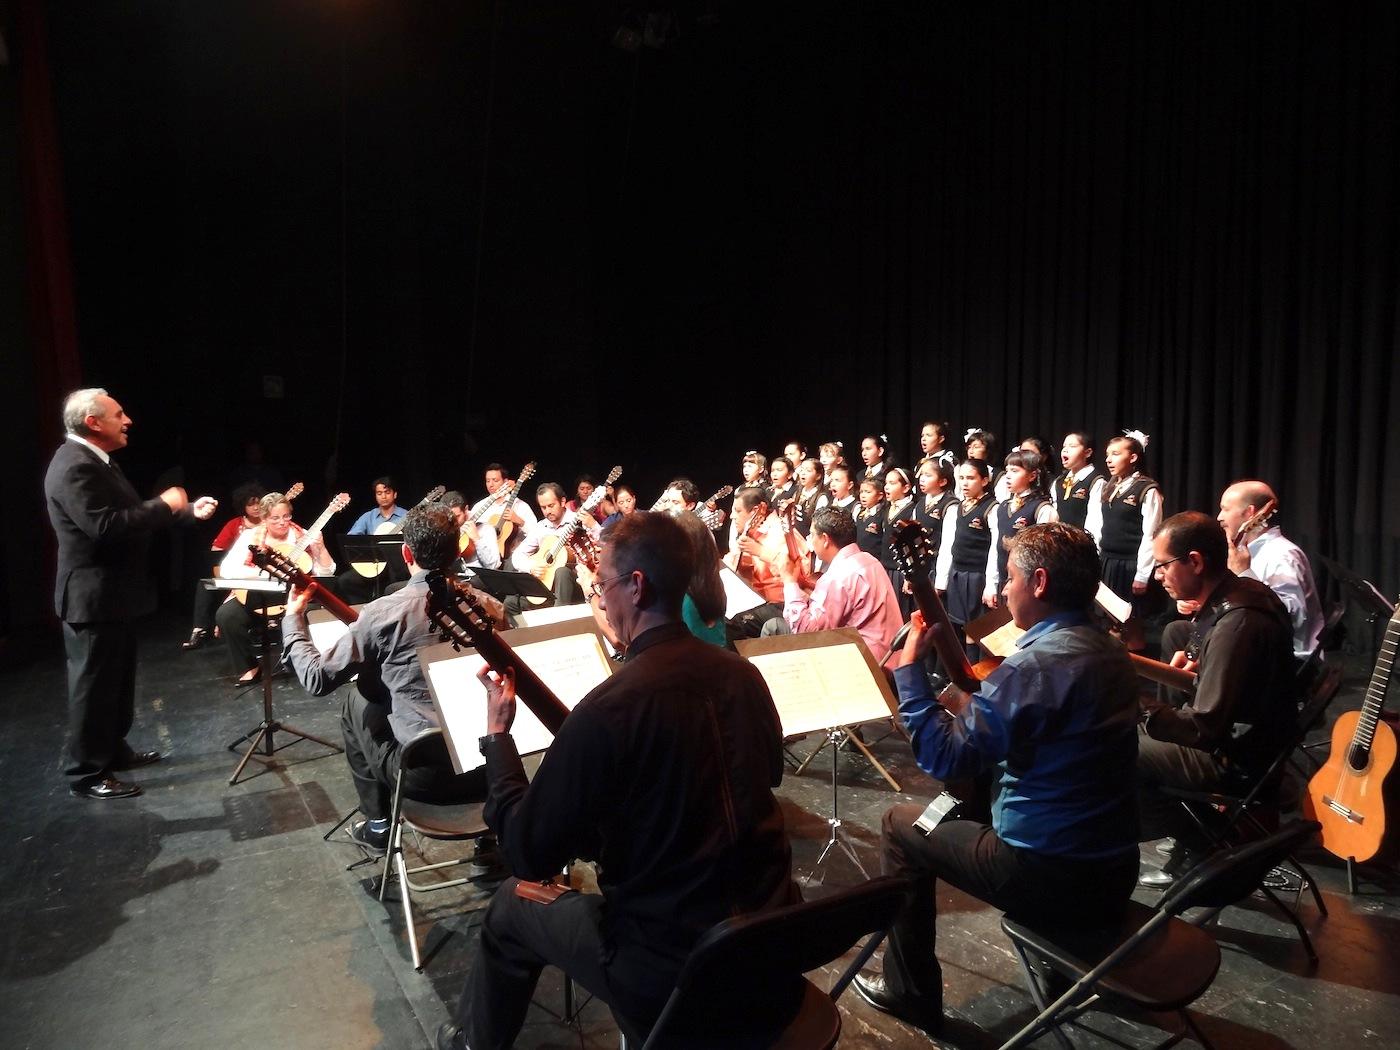 Orquesta de Guitarras engalana el Festival Siete Décadas de Luz